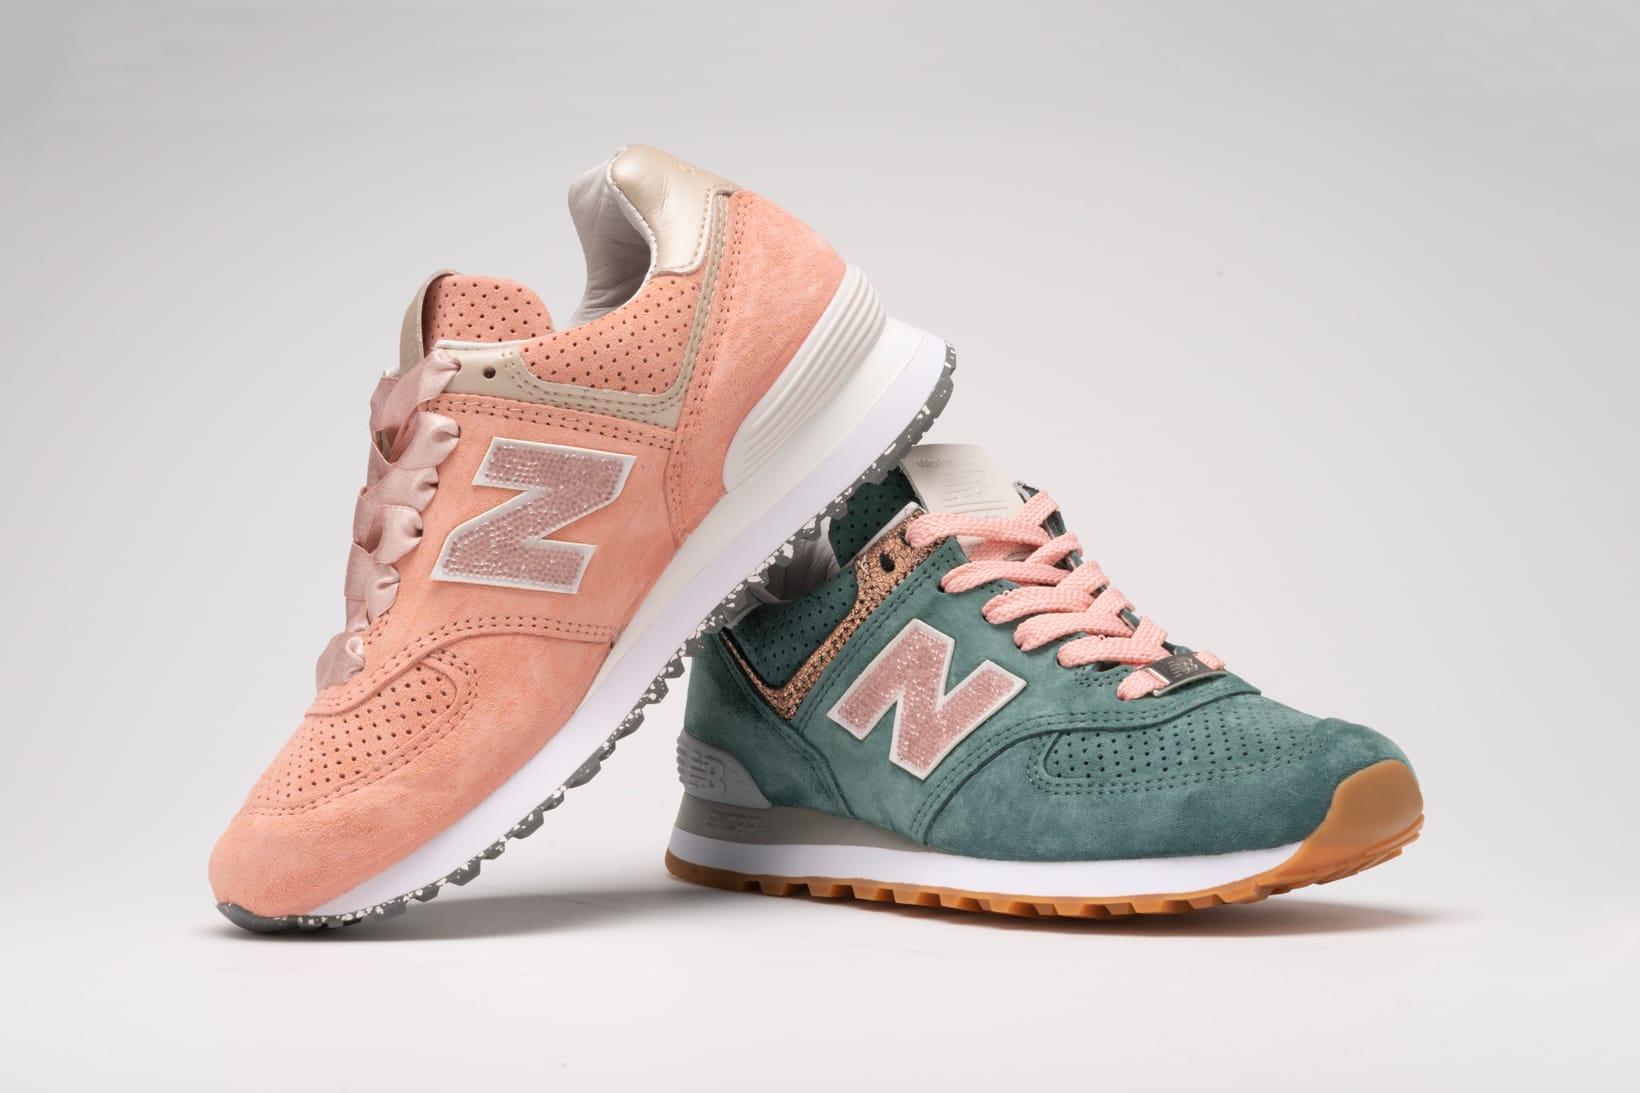 New Balance Releases NB1 574 Swarovski